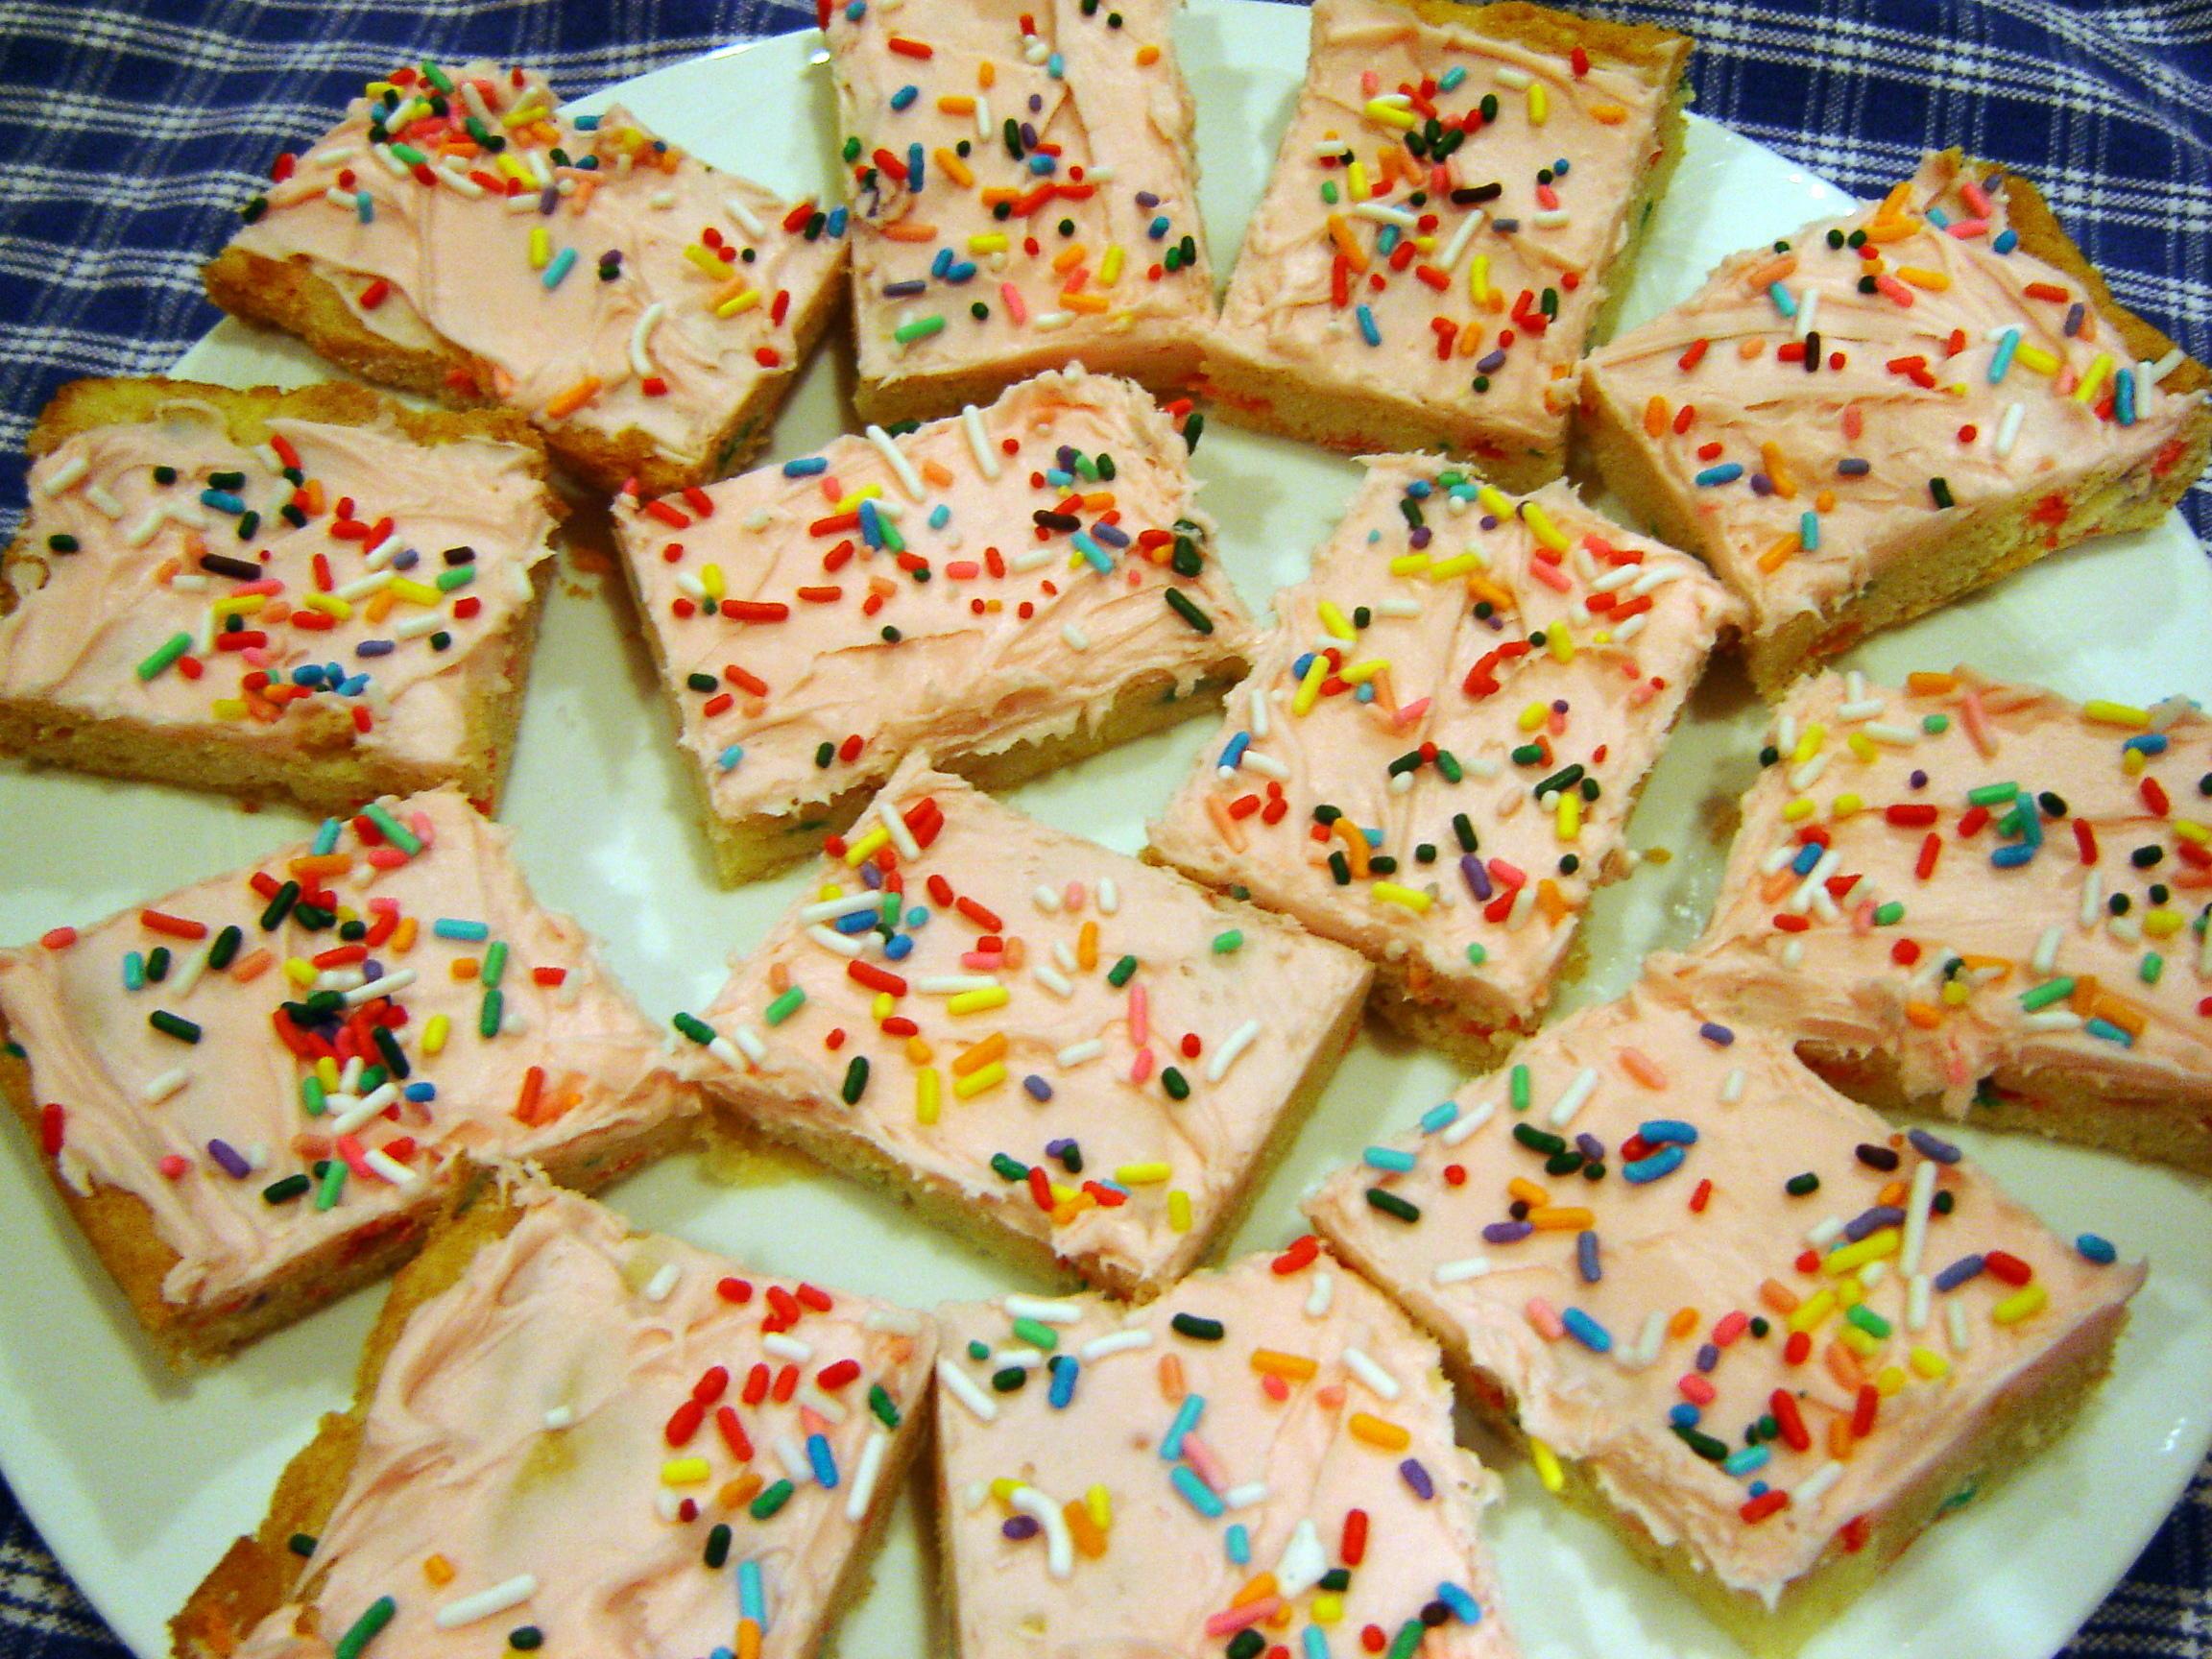 10 Birthday Cake Flavored Treats